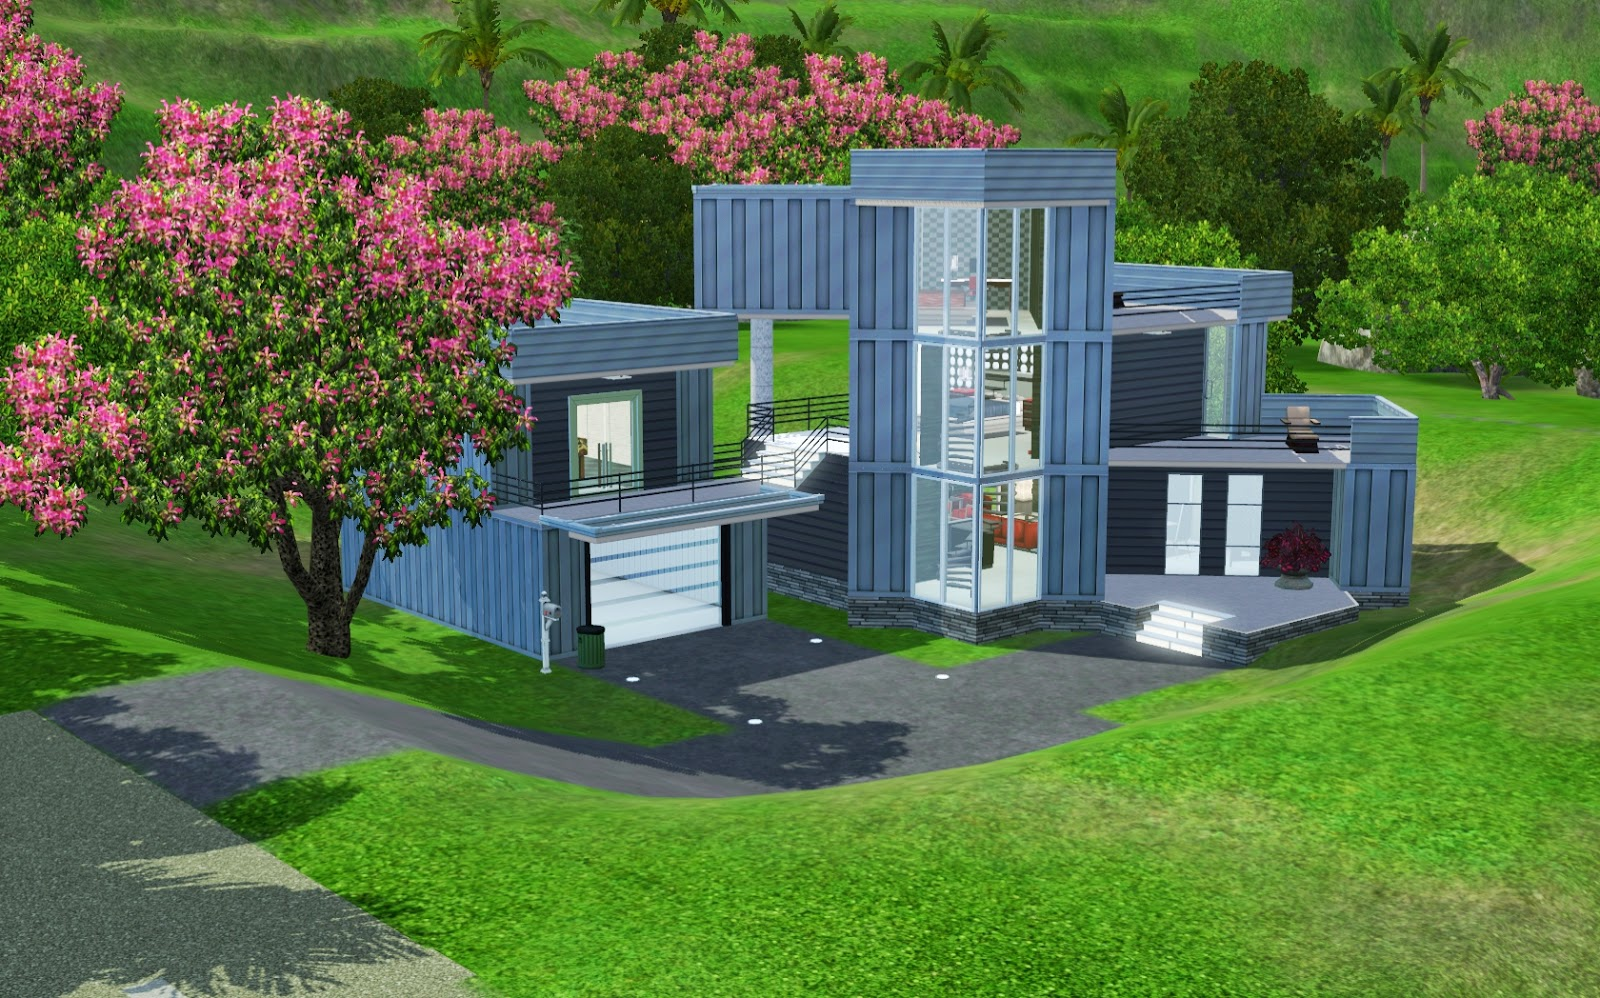 Summers Little Sims 3 Garden Isla Paradiso The Sims 3 Island